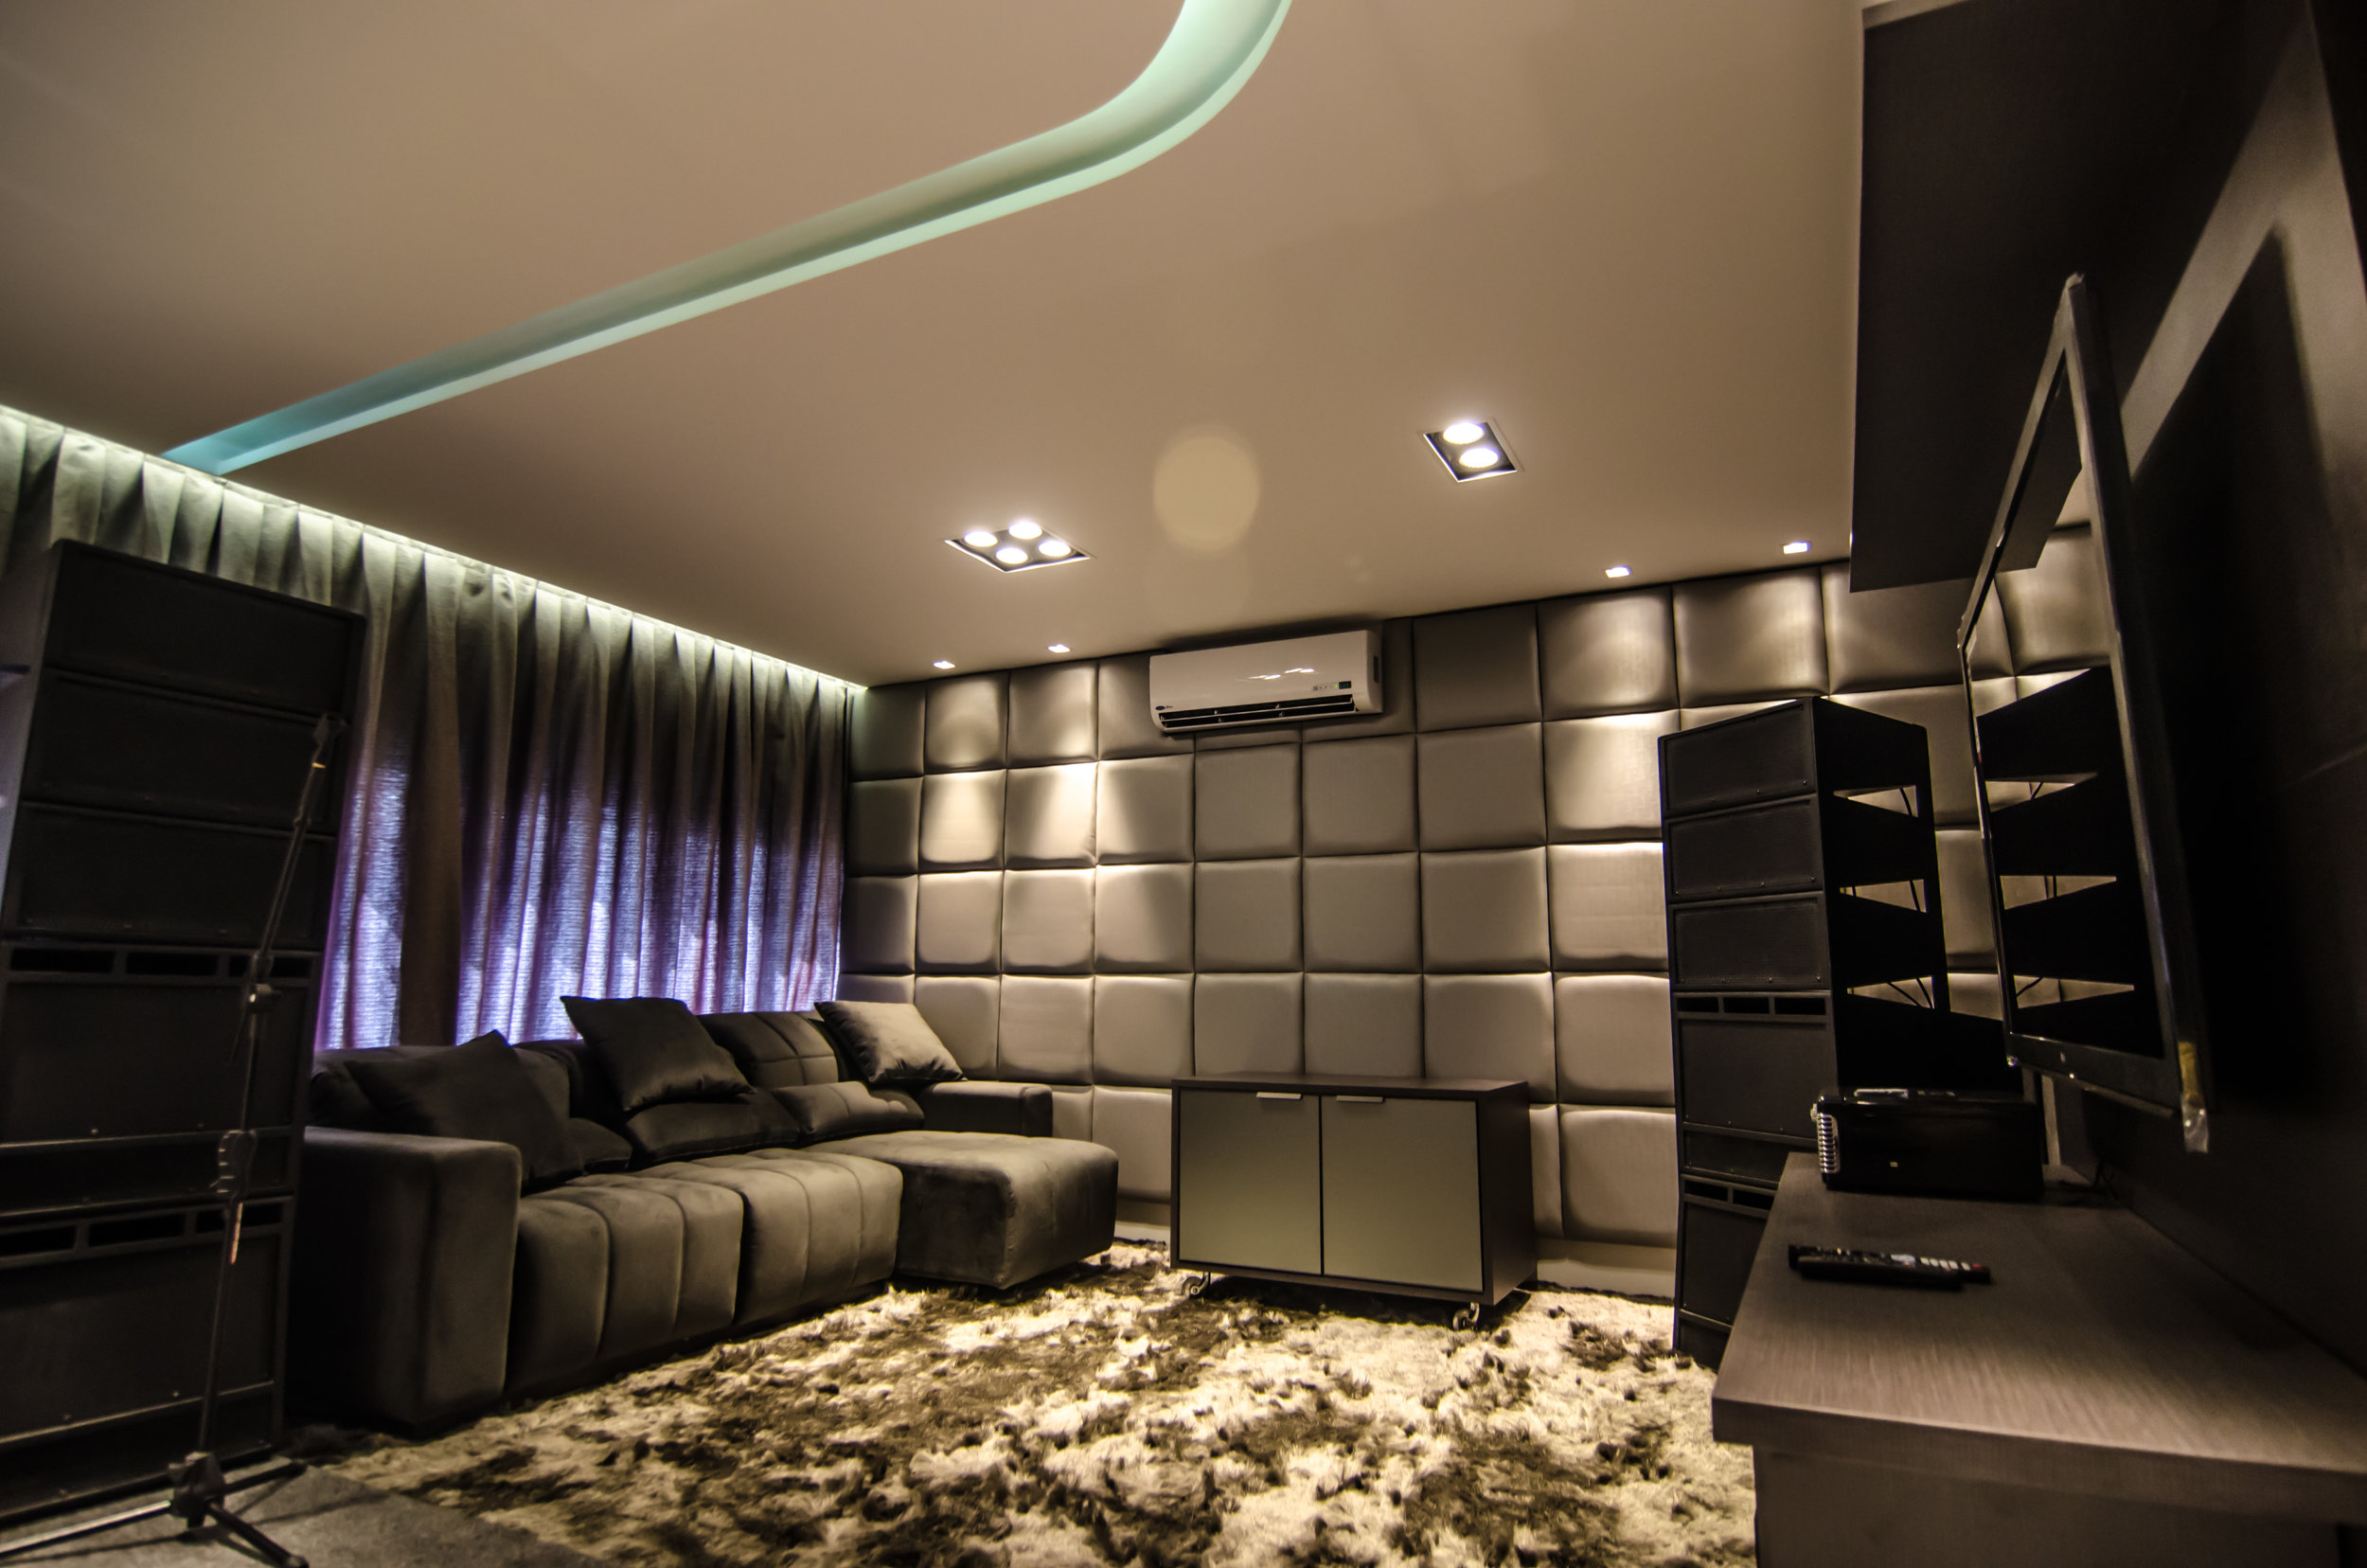 projeto-arquitetonico-alexandrepinto-duo-arquitetura-casa-016.jpg